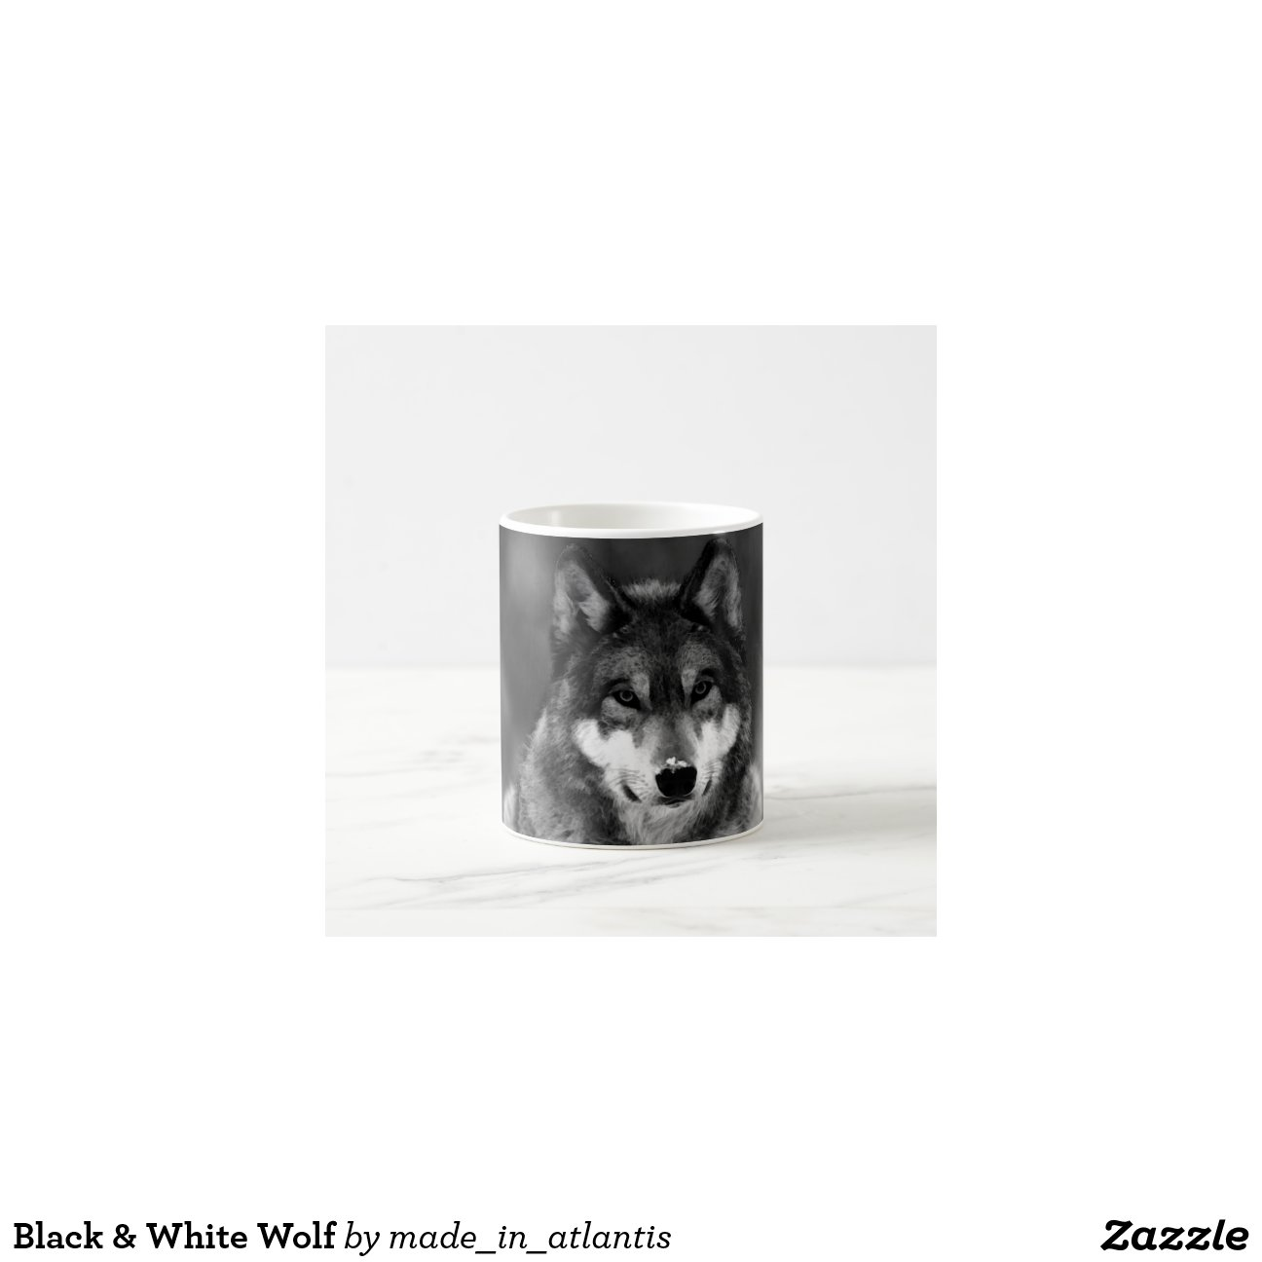 loup noir et blanc mug blanc zazzle. Black Bedroom Furniture Sets. Home Design Ideas